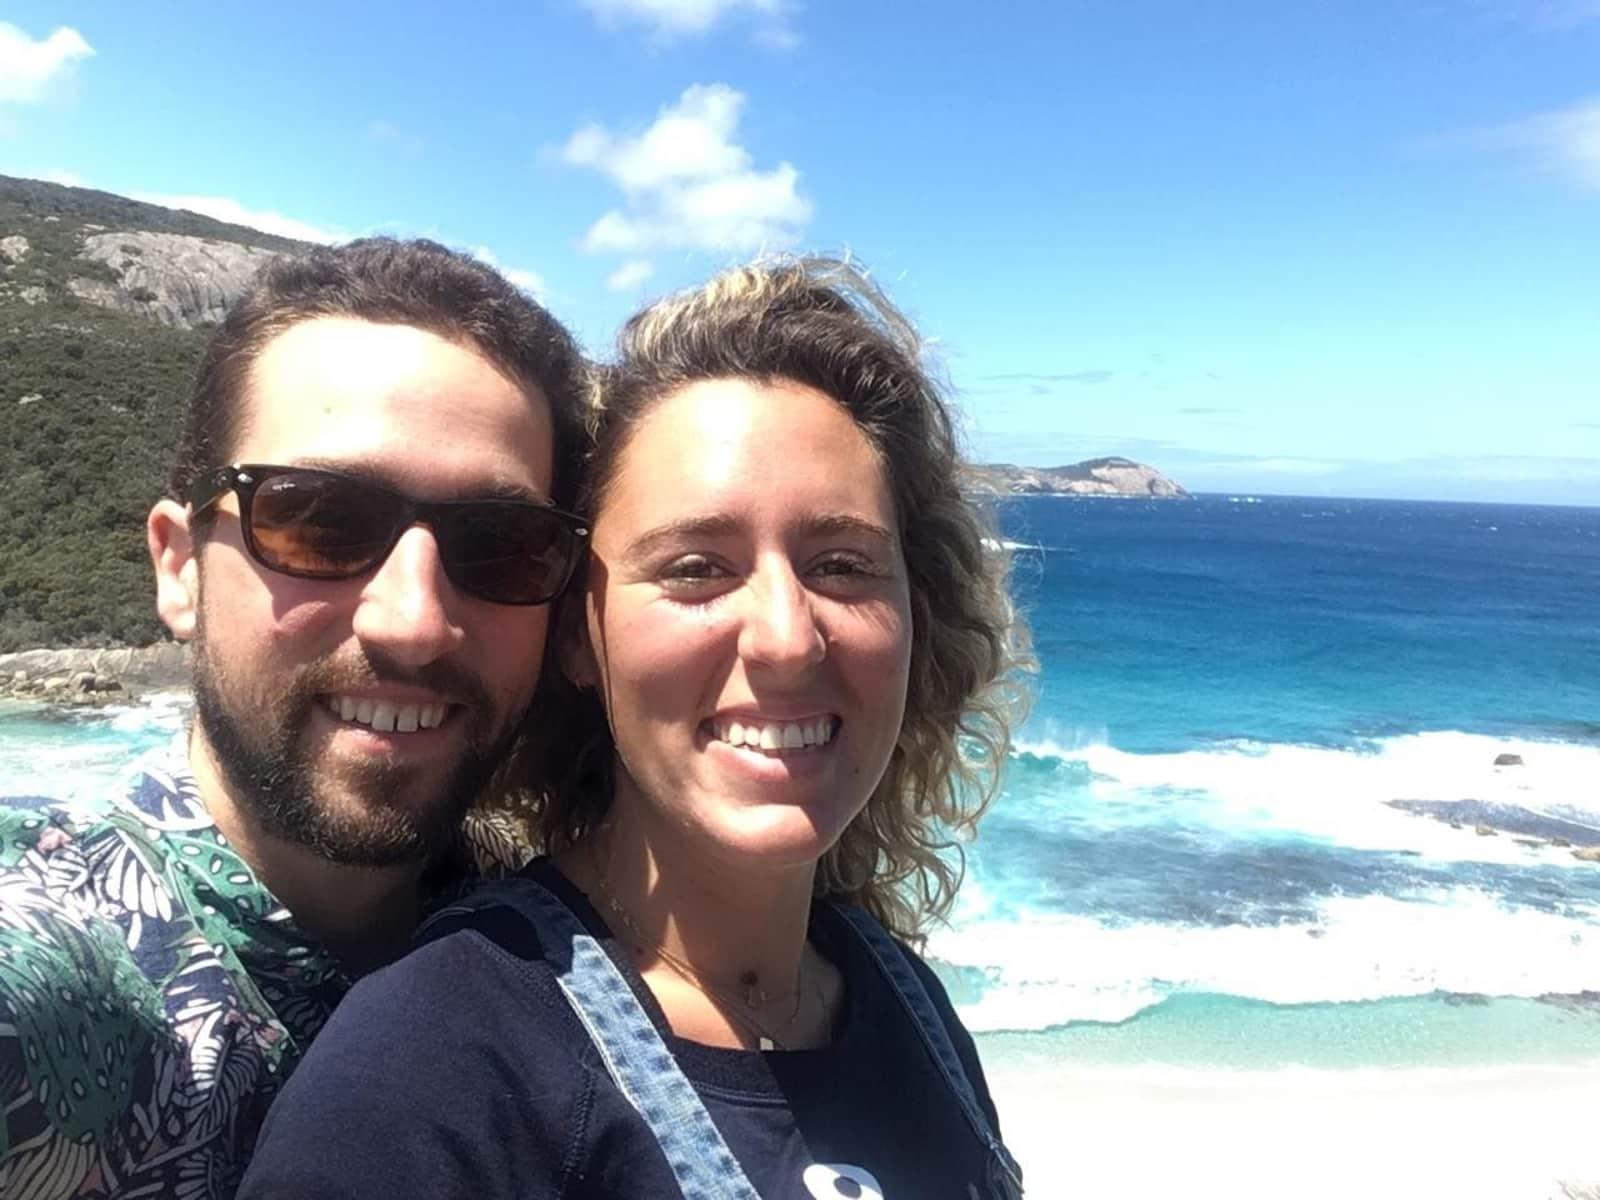 Manon & Benjamin from Margaret River, Western Australia, Australia